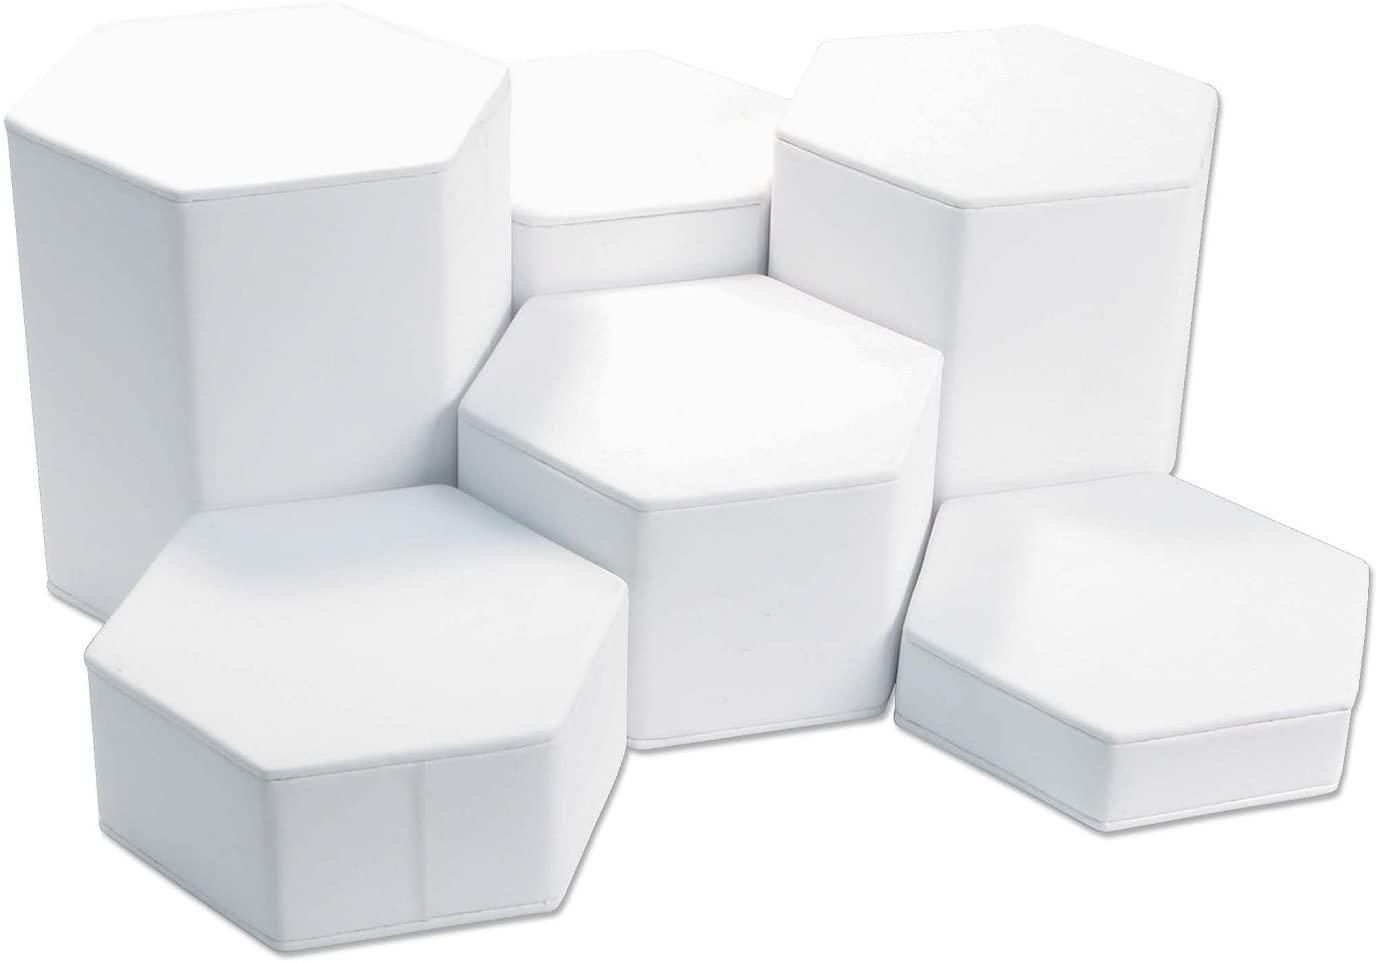 Riser Set 6 Piece White Jewelry Display